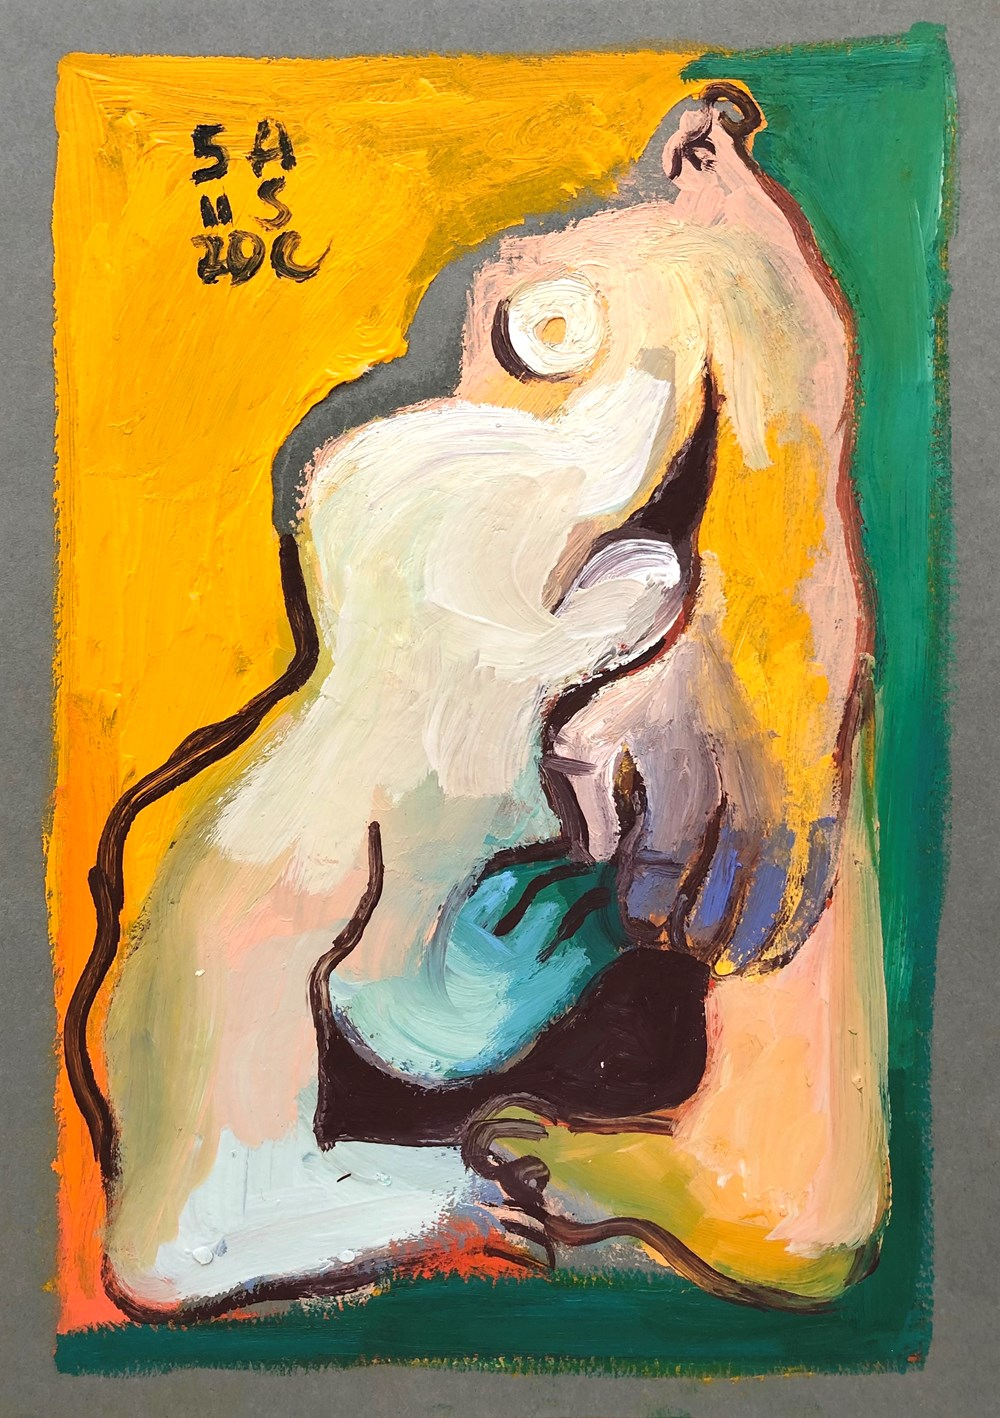 Life on Venus III   The Organic, Live Auction - Lot 17, Alice Suret-Canale, 450 Degree Heatwave